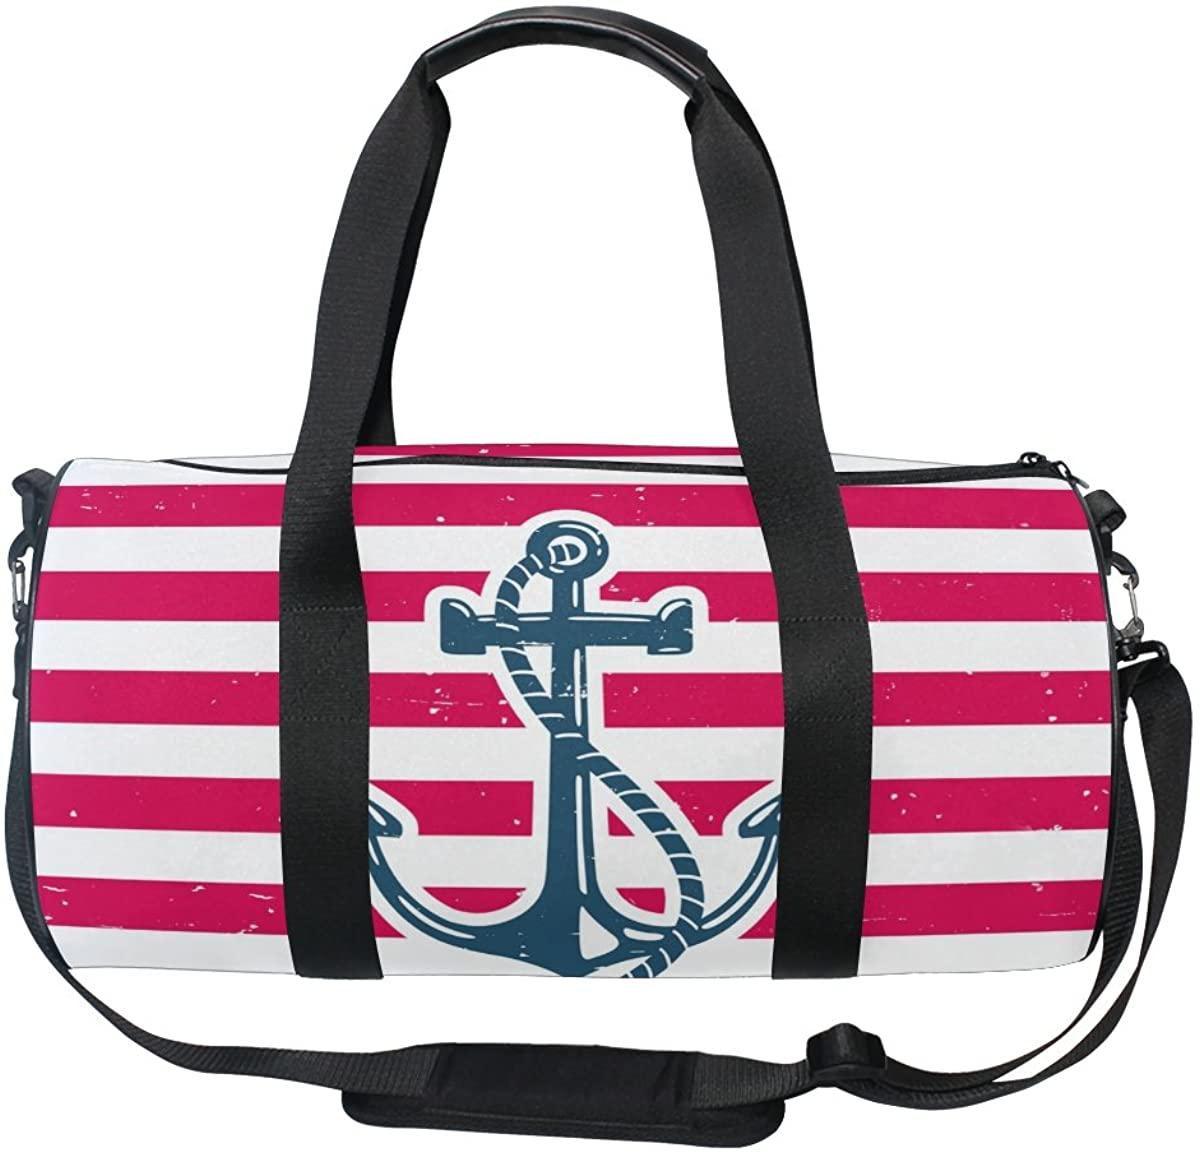 ALAZA Vintage Anichor Chevron Sports Gym Duffel Bag Travel Luggage Handbag for Men Women